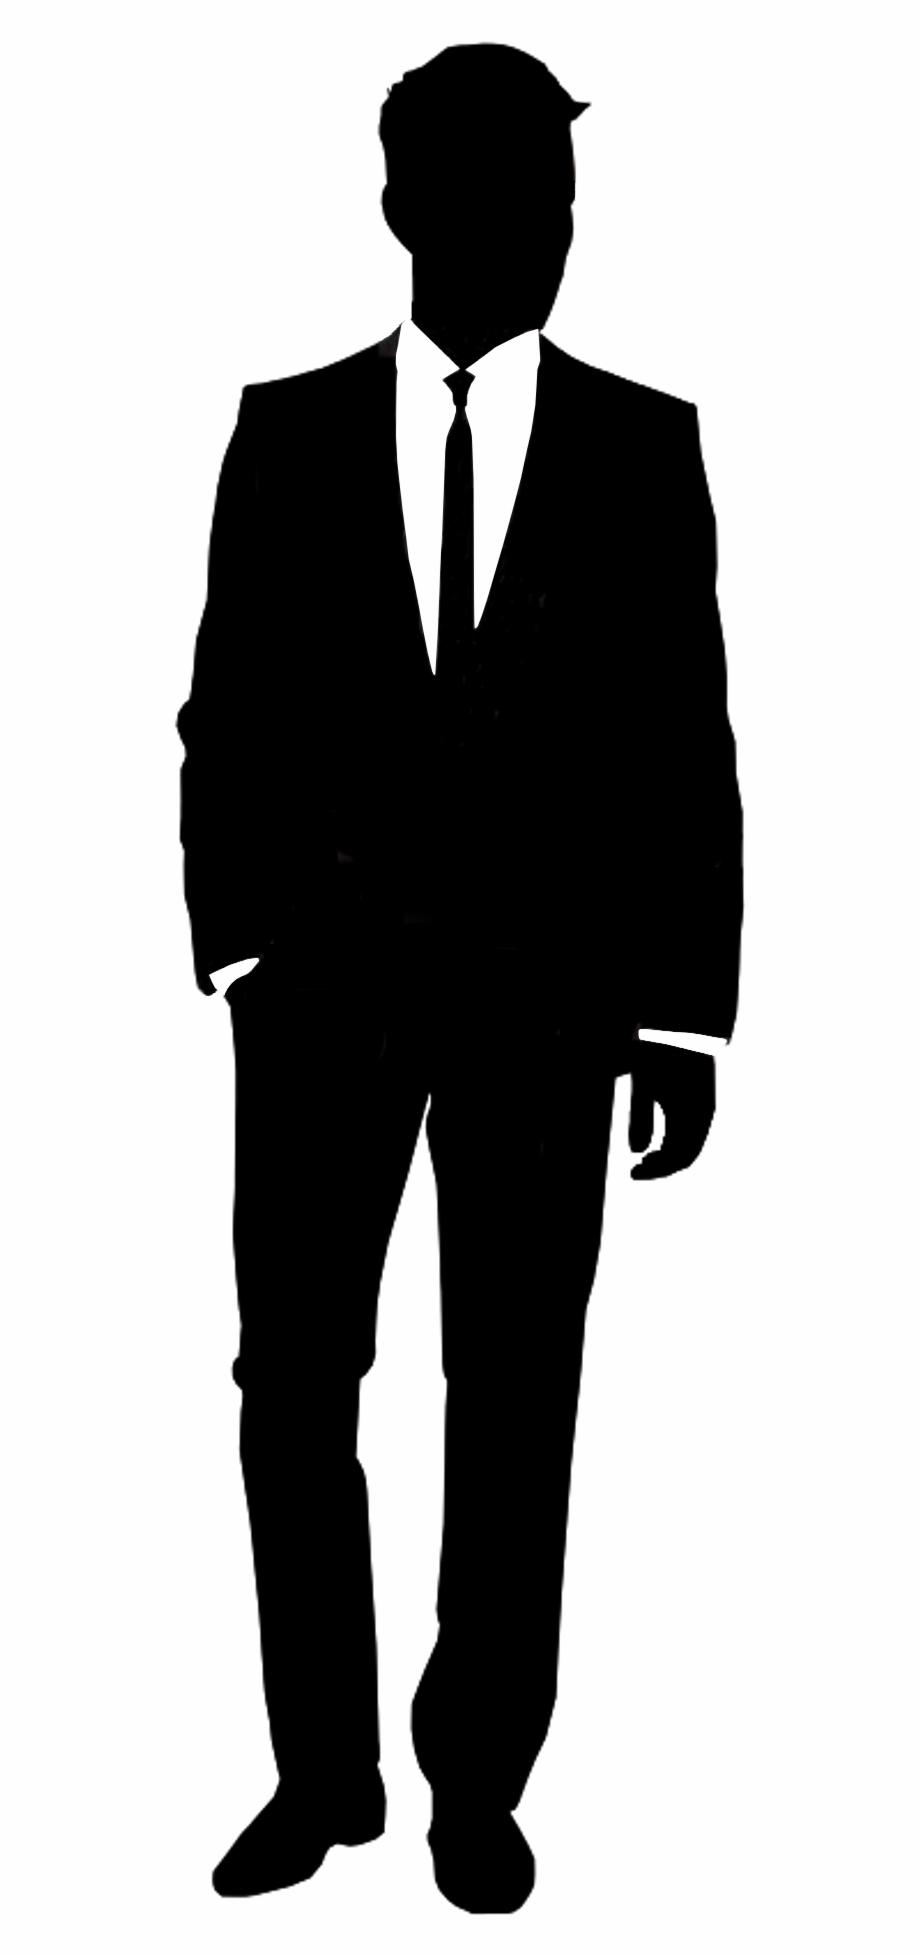 Suit Silhouette Shirt Informal Attire Men In Suit.